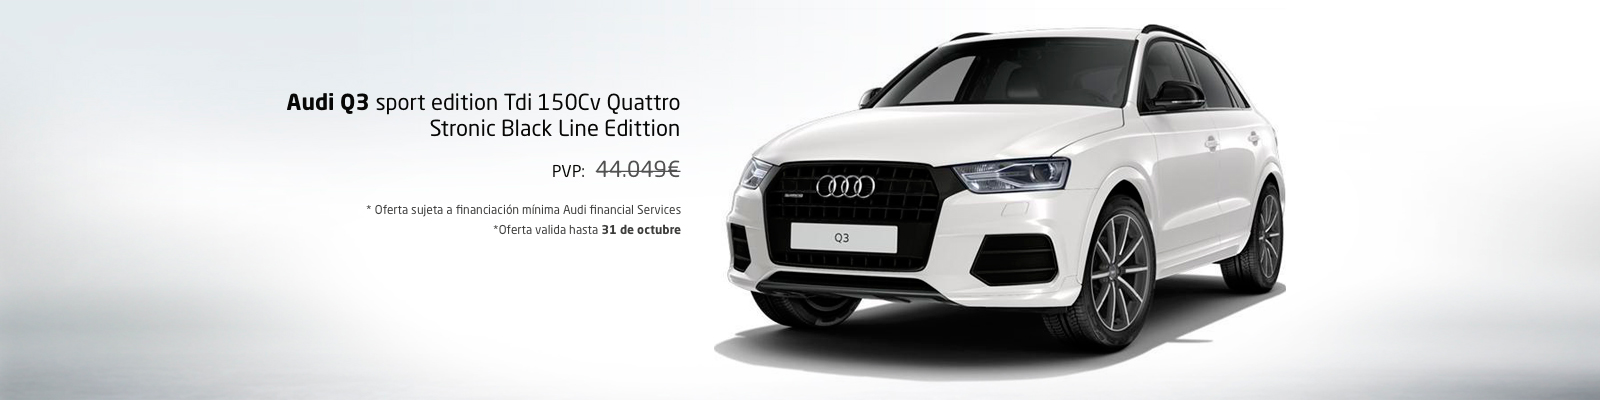 Oferta nuevo Audi Q3